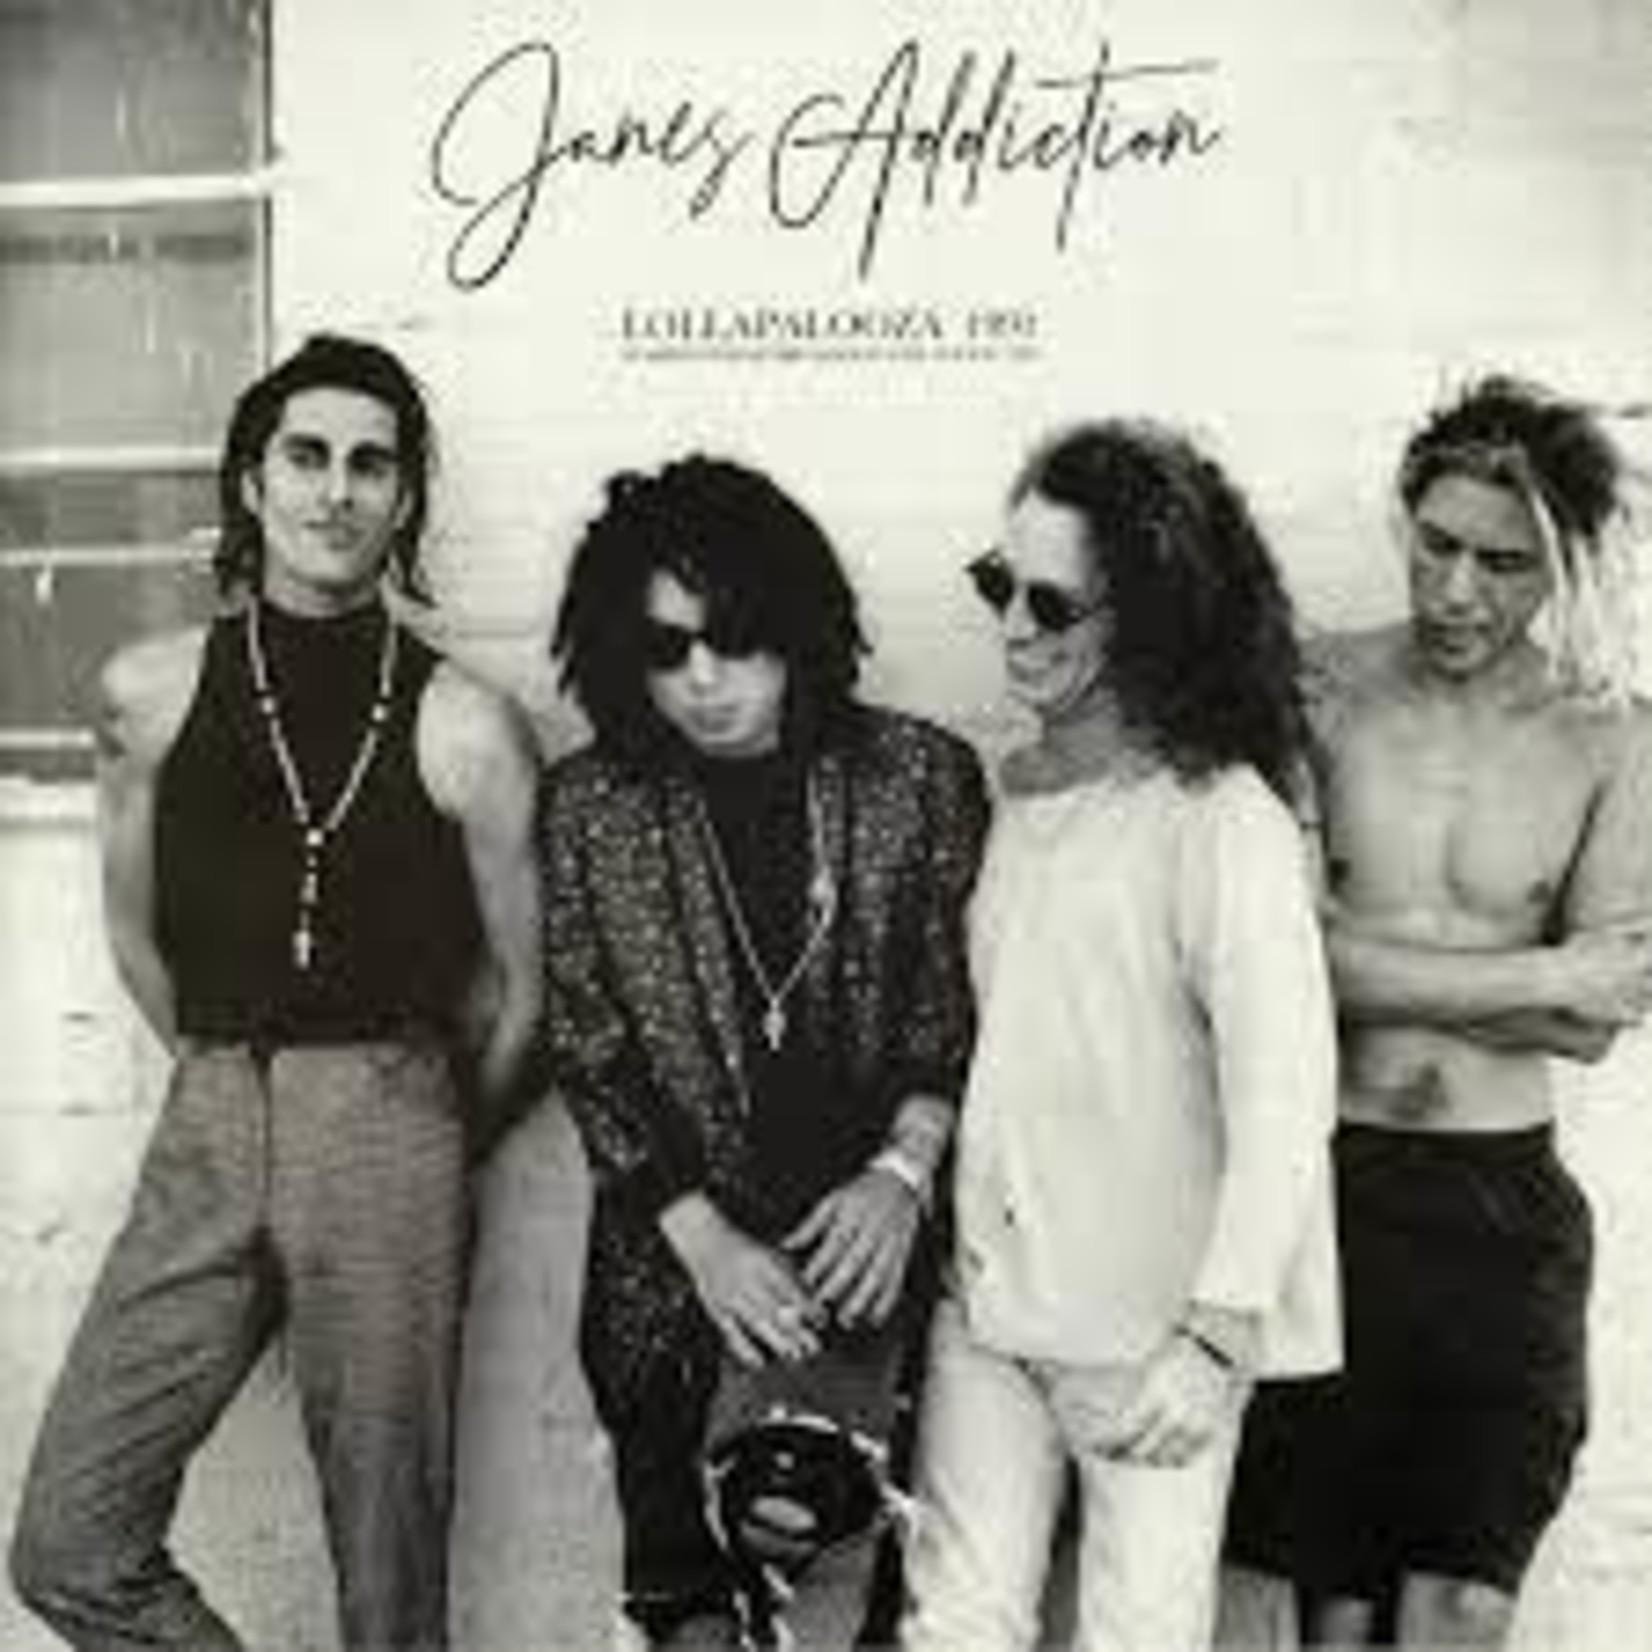 JANES ADDICTION - LOLLAPALOOZA 1991 2LP (VINYL)